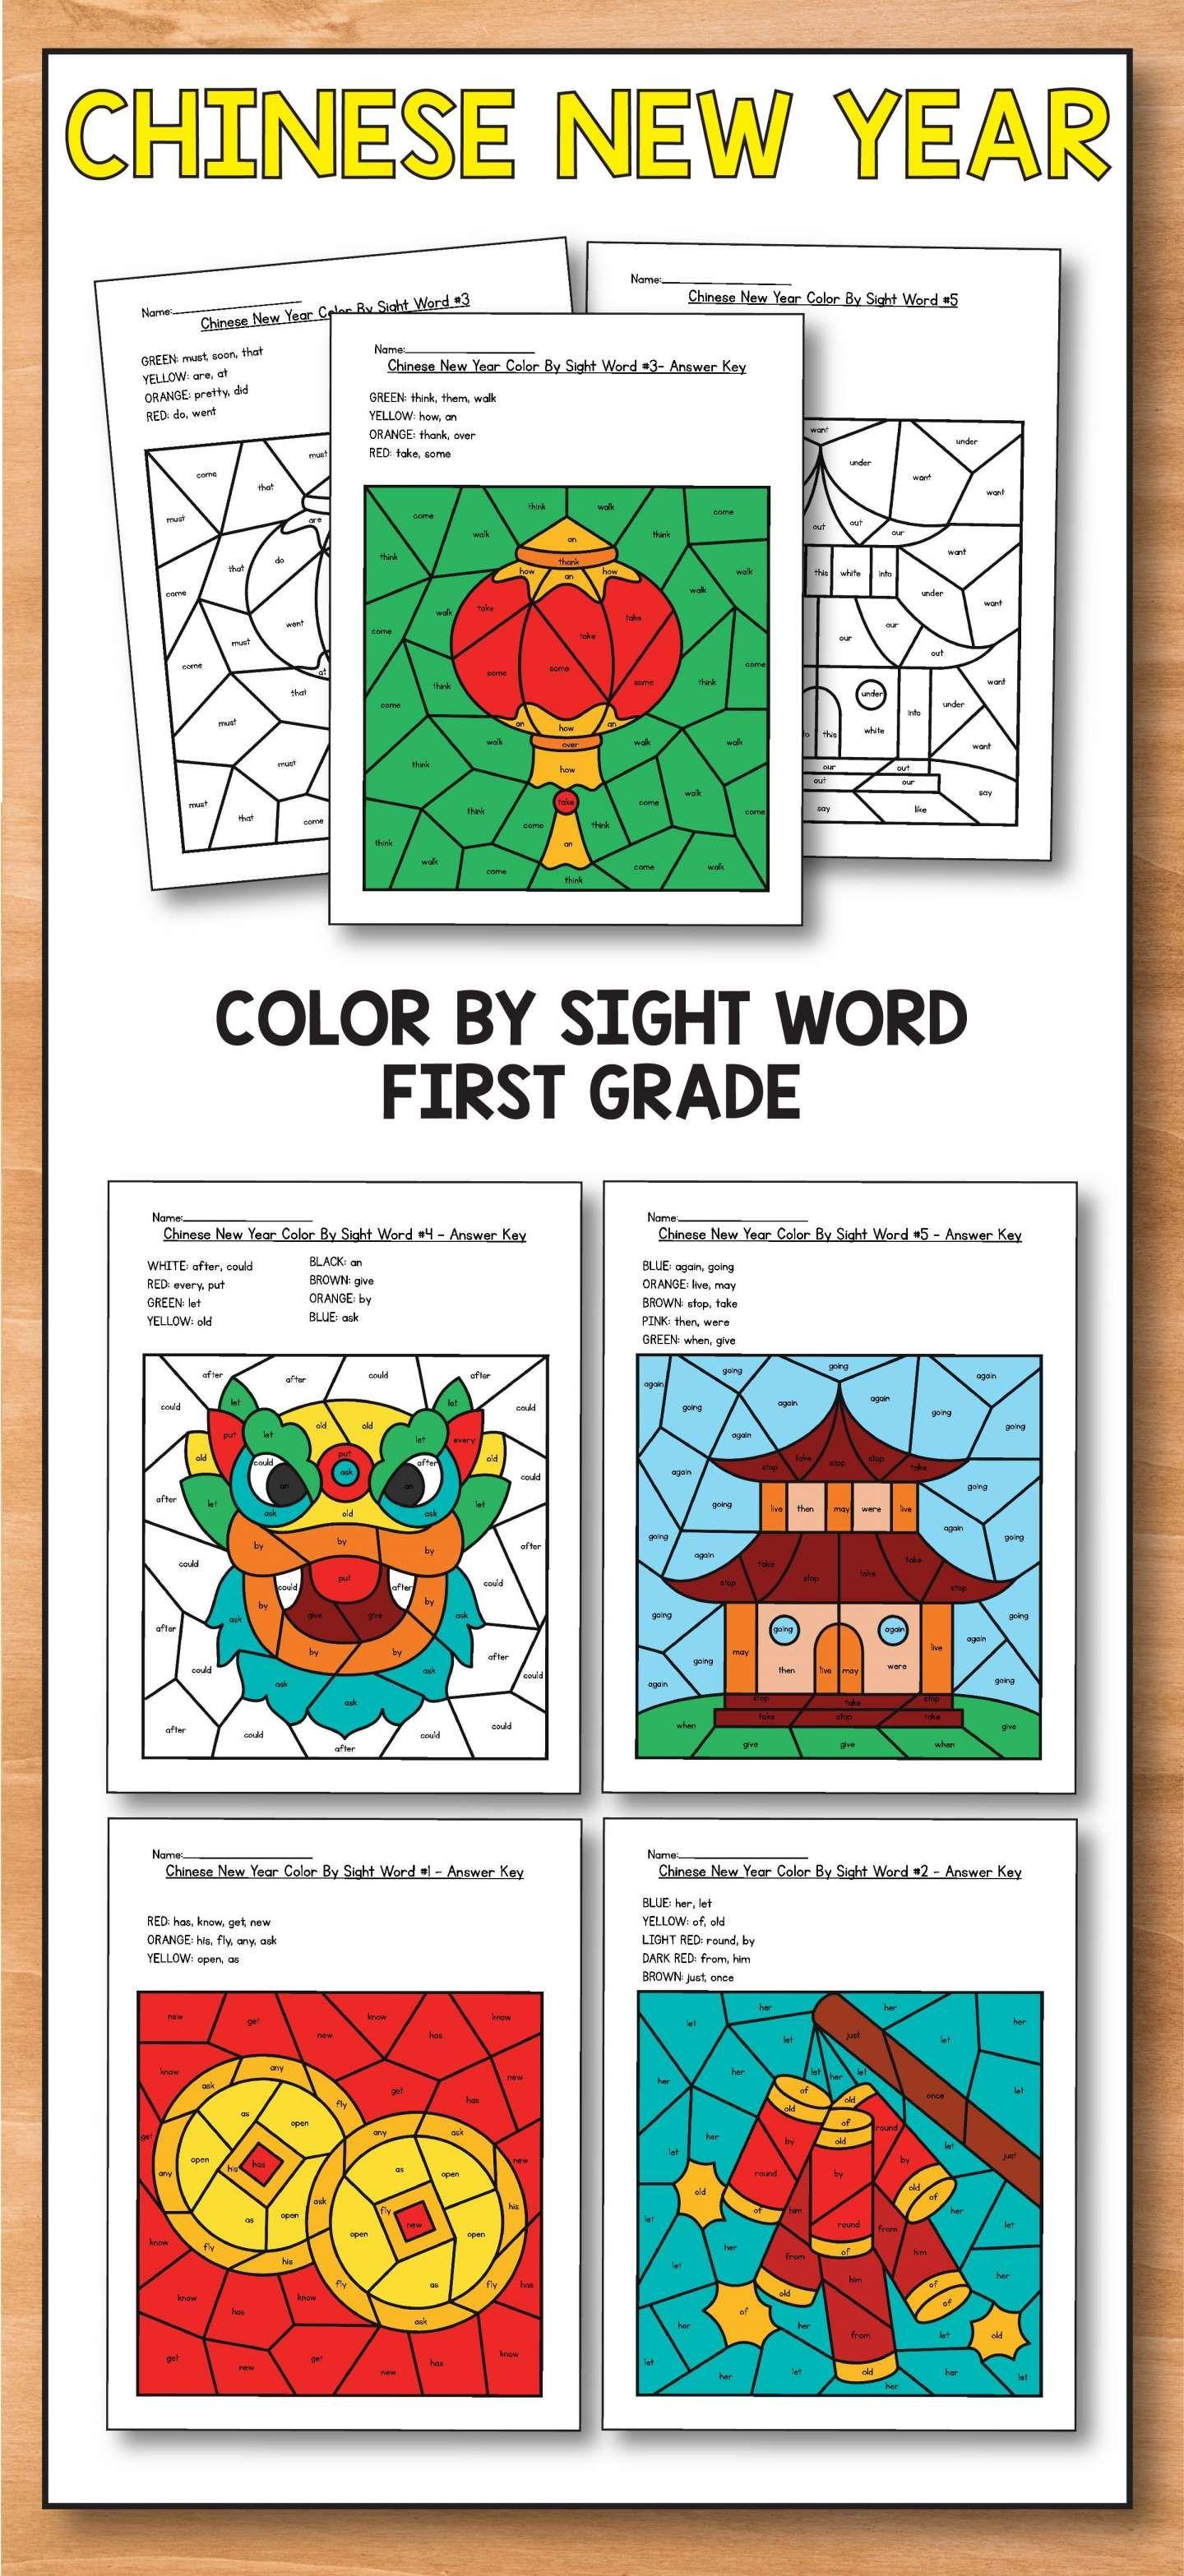 12 Chinese New Year Worksheet 1st Grade